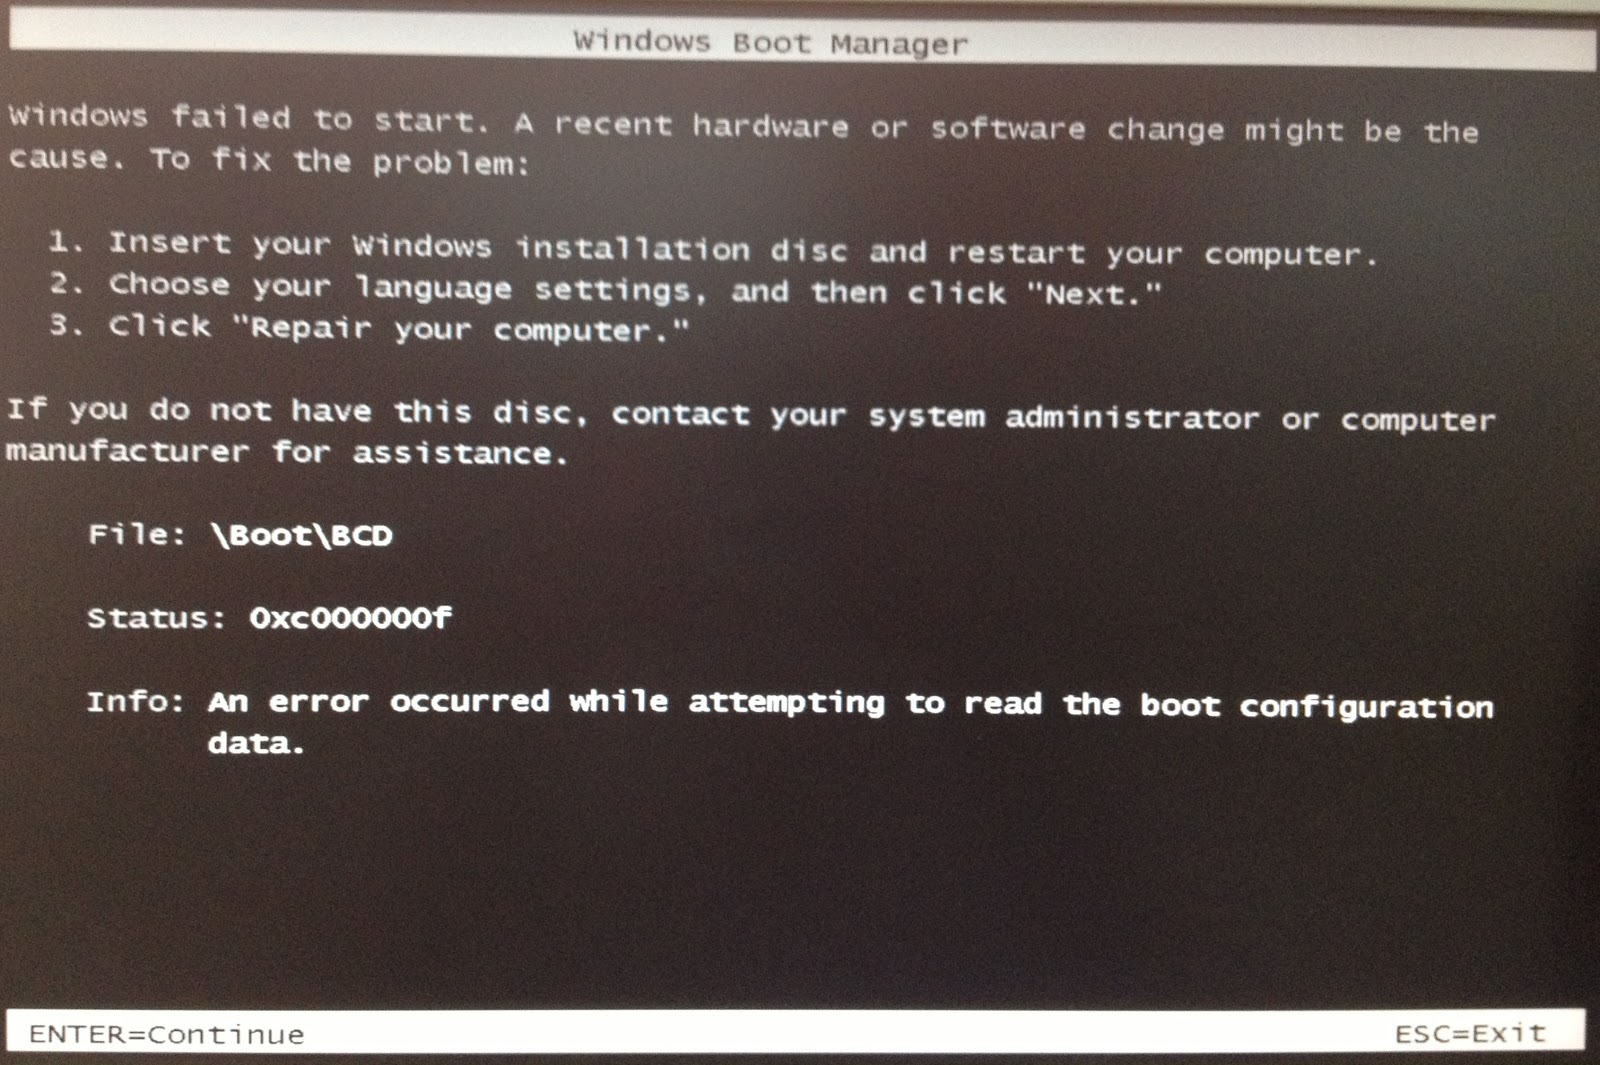 How to fix boot error 0xc000000f in Windows Server 2008